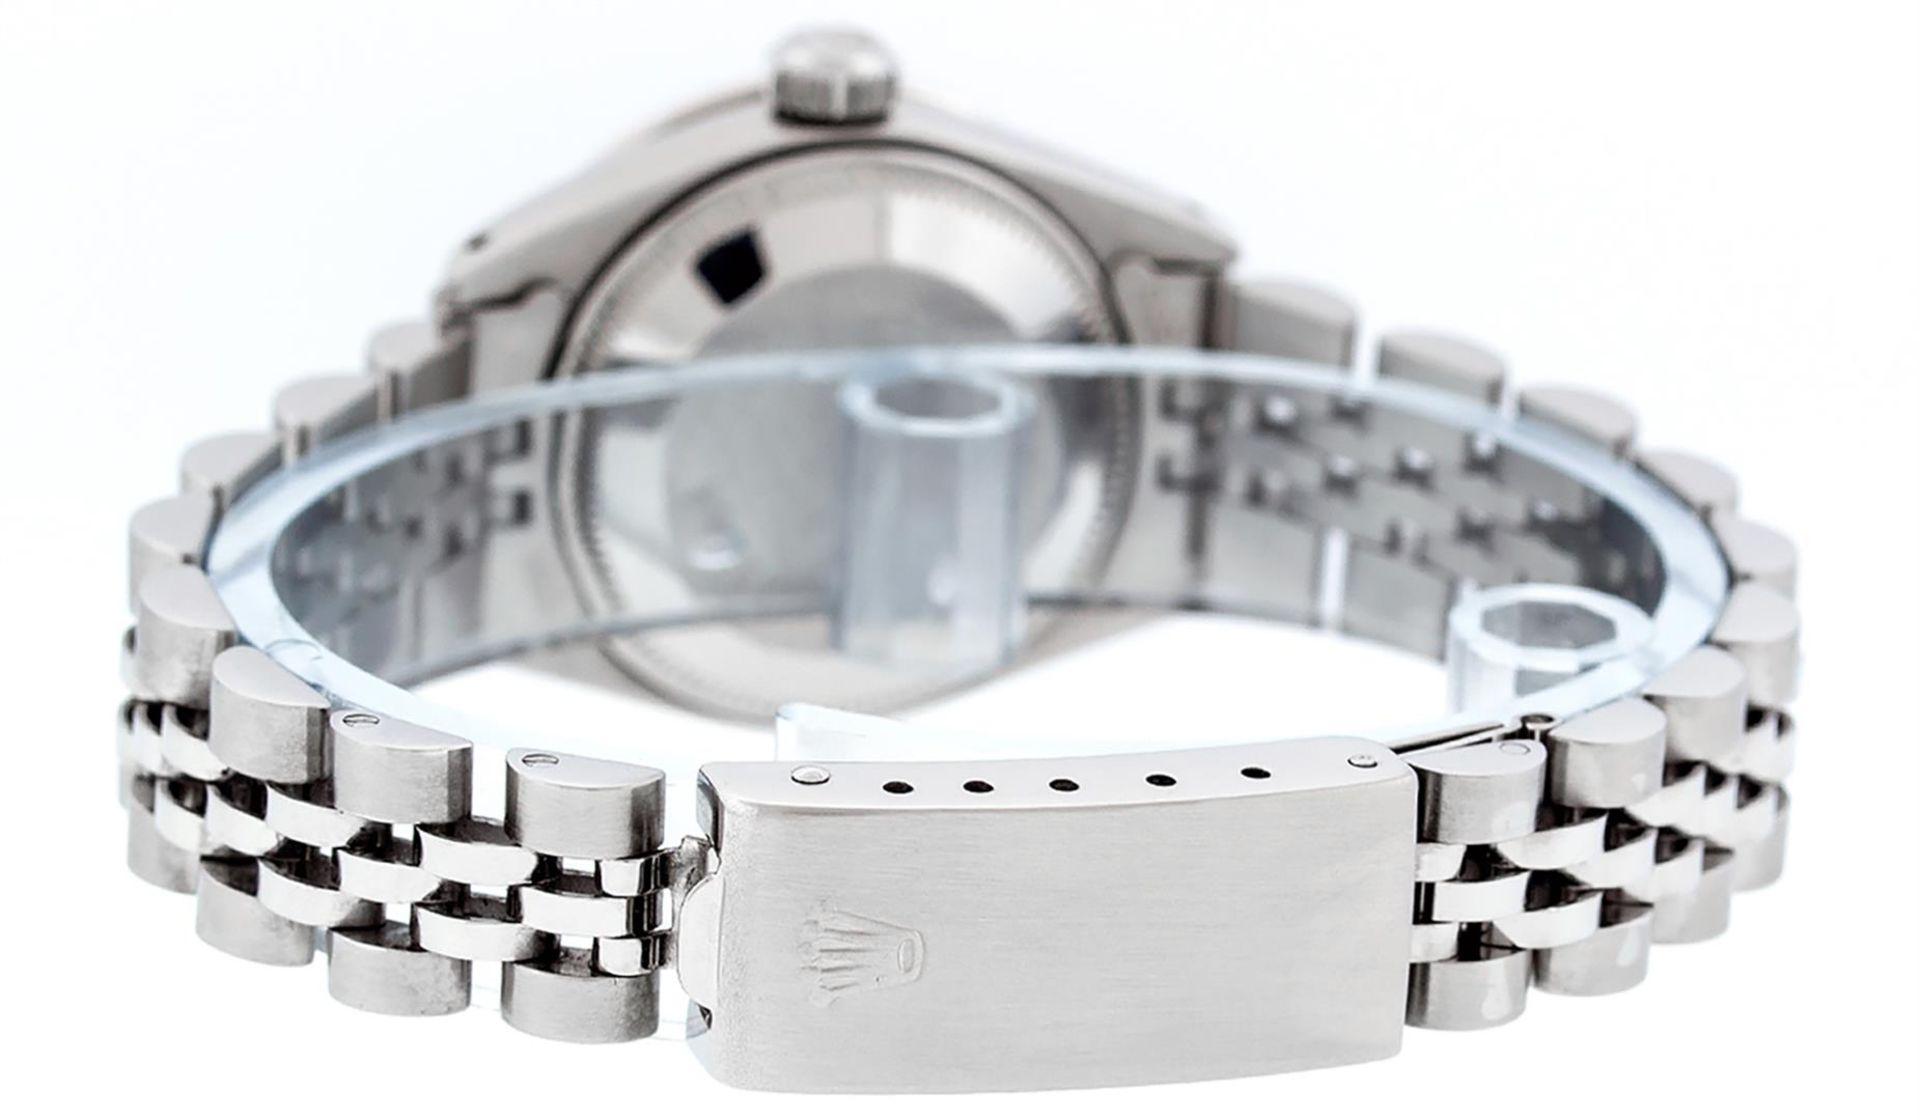 Rolex Ladies Stainless Steel Blue MOP Diamond & Emerald Datejust Wristwatch - Image 7 of 9